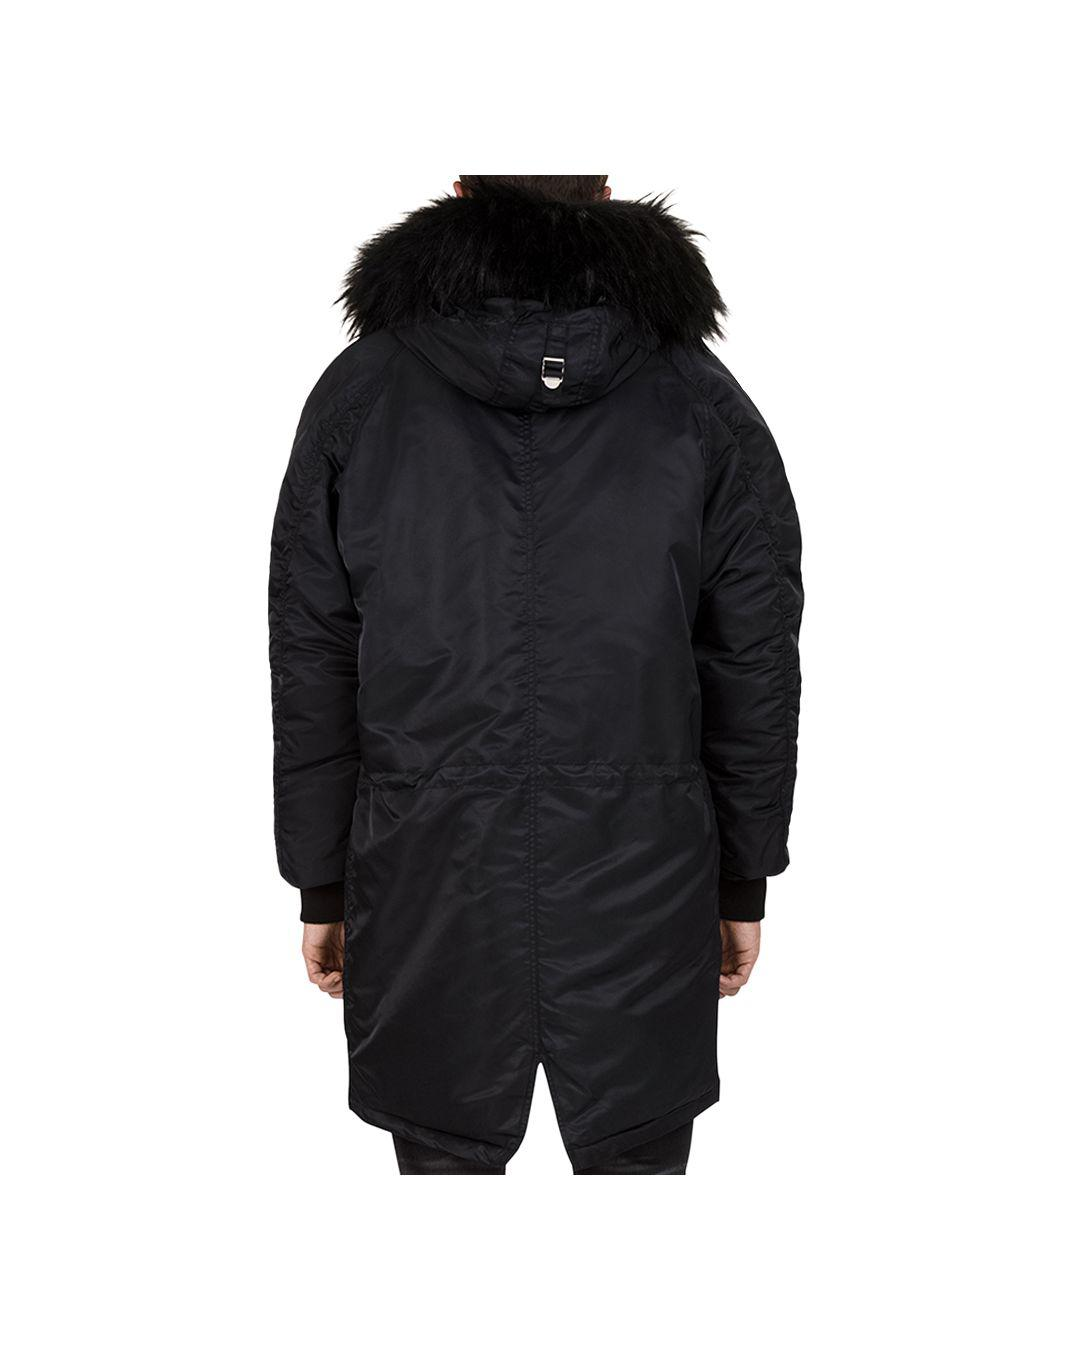 851090d2dd16 Lyst - The Kooples Oversized Contrast-fabric Parka Jacket in Black for Men